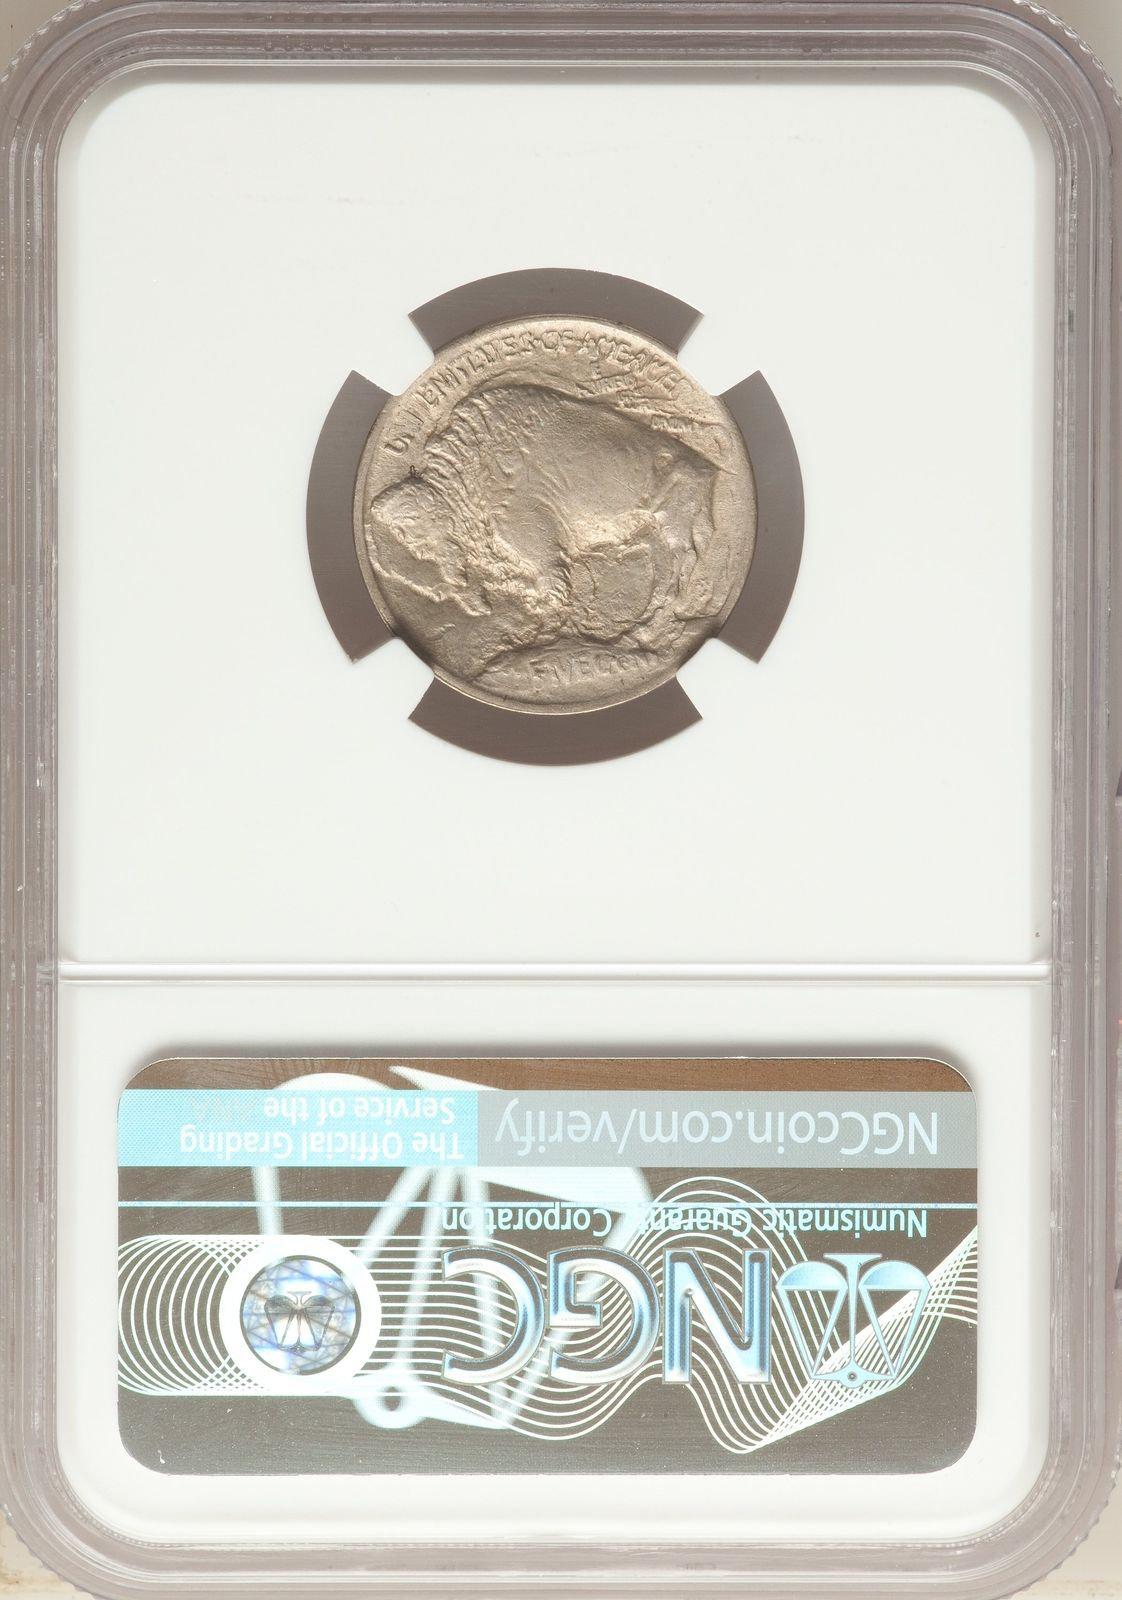 VERY Interesting 1913 type one buffalo nickel for sale on eBay